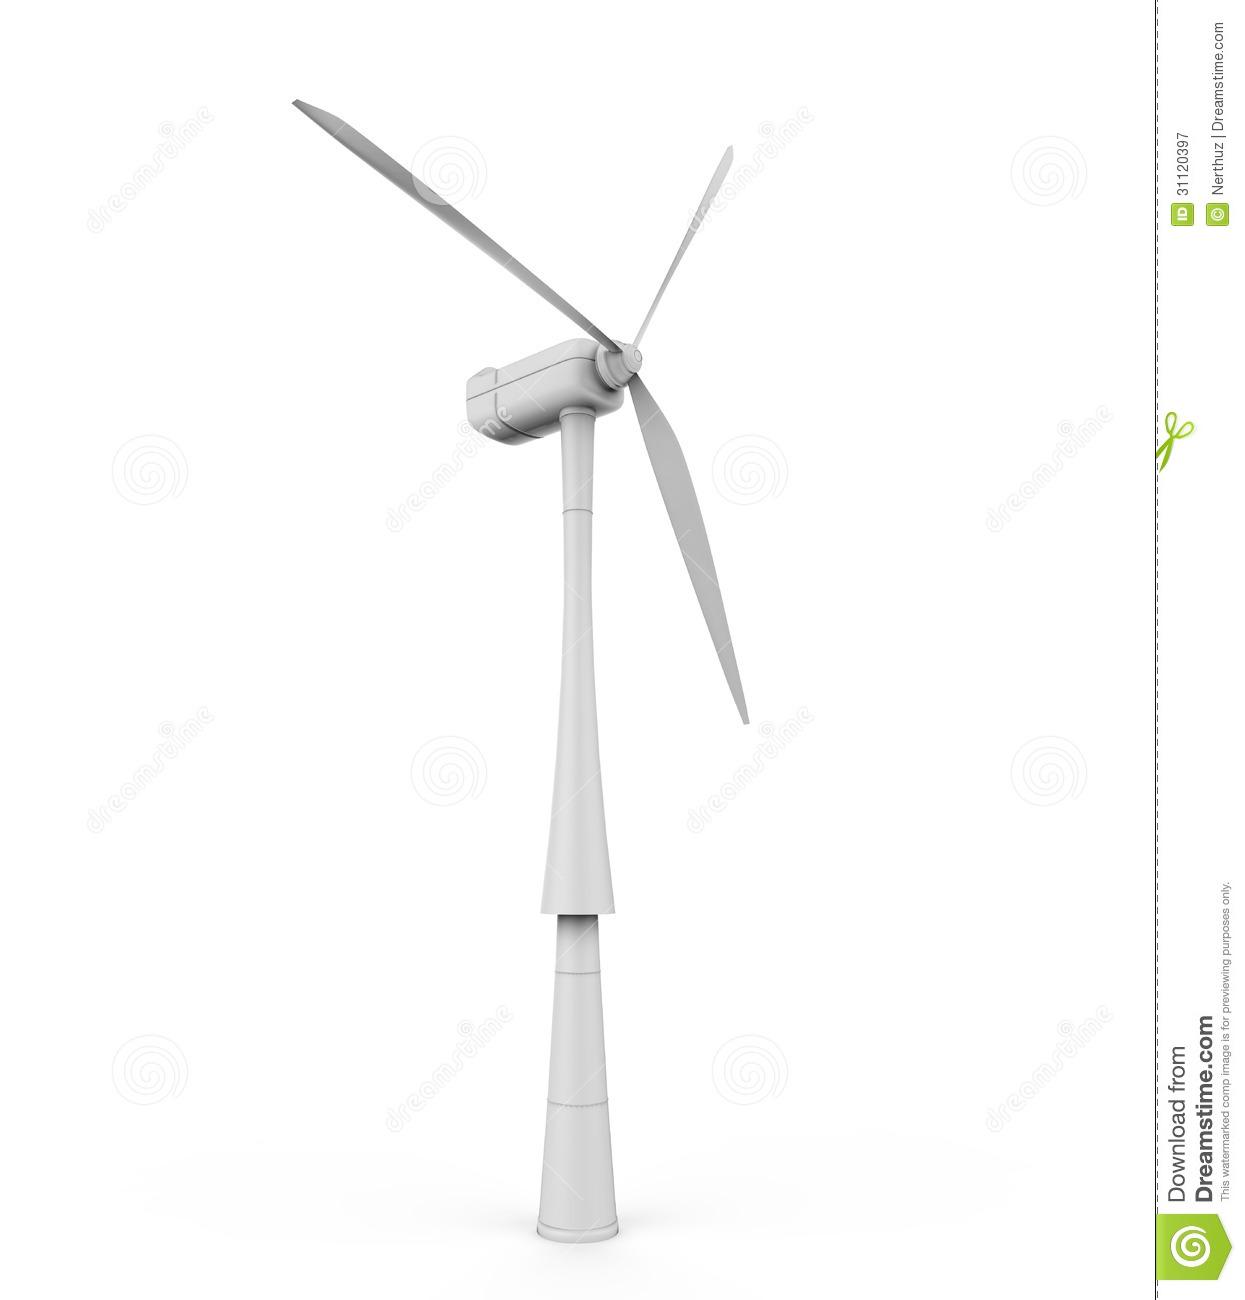 Windturbine Stock Illustrations.